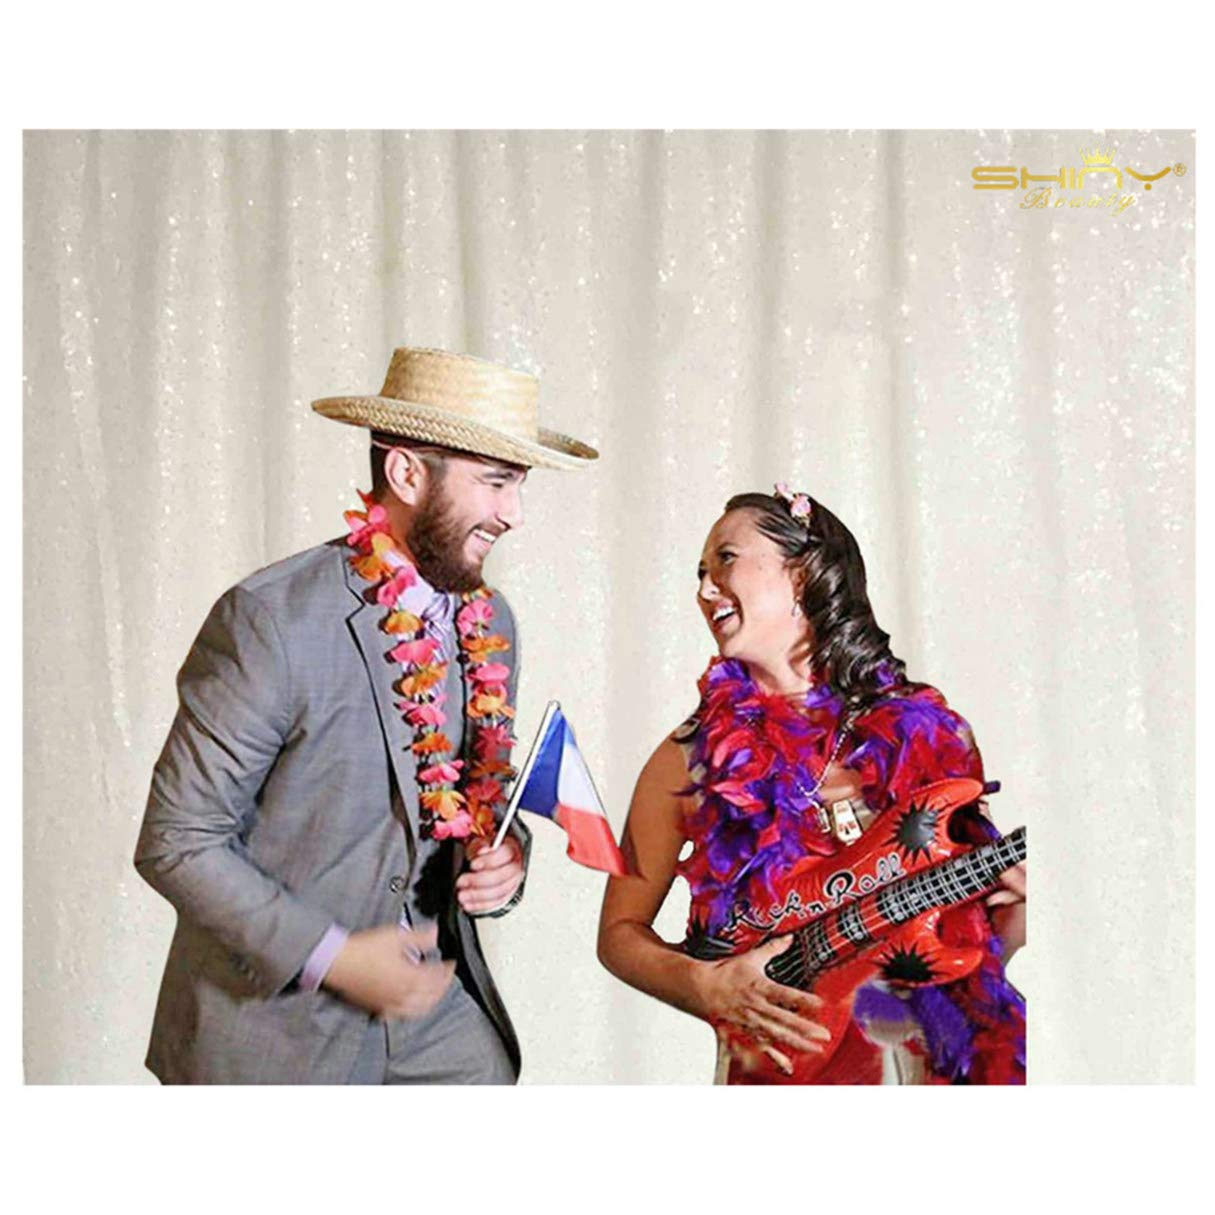 ShiDianYi 6フィートx6フィート スパンコール写真背景 フォトブース背景 シーケンス背景 結婚式用 7FTx7FT Sequin Backdrop Curtain White 7x7   B07KJK5L8V